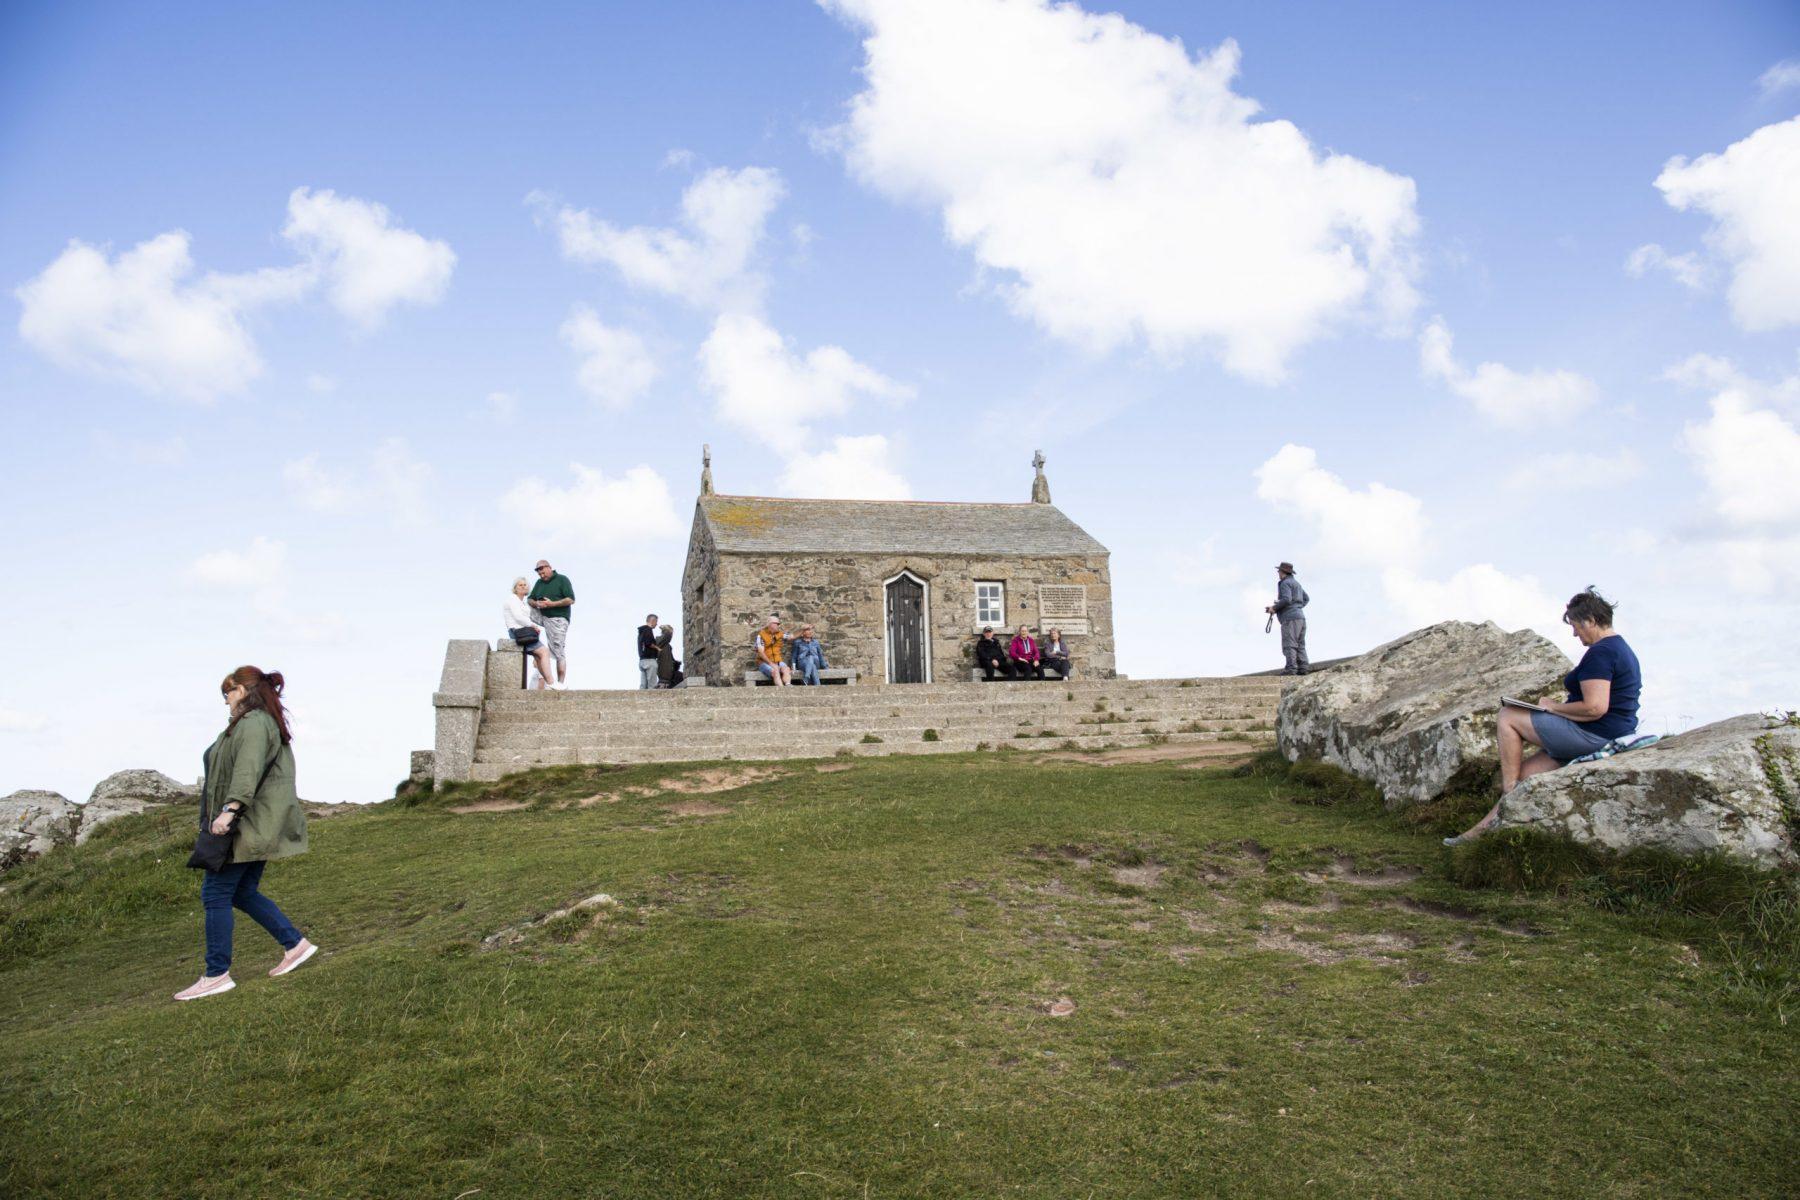 St Nicolas Chapel, St Ives, Cornwall